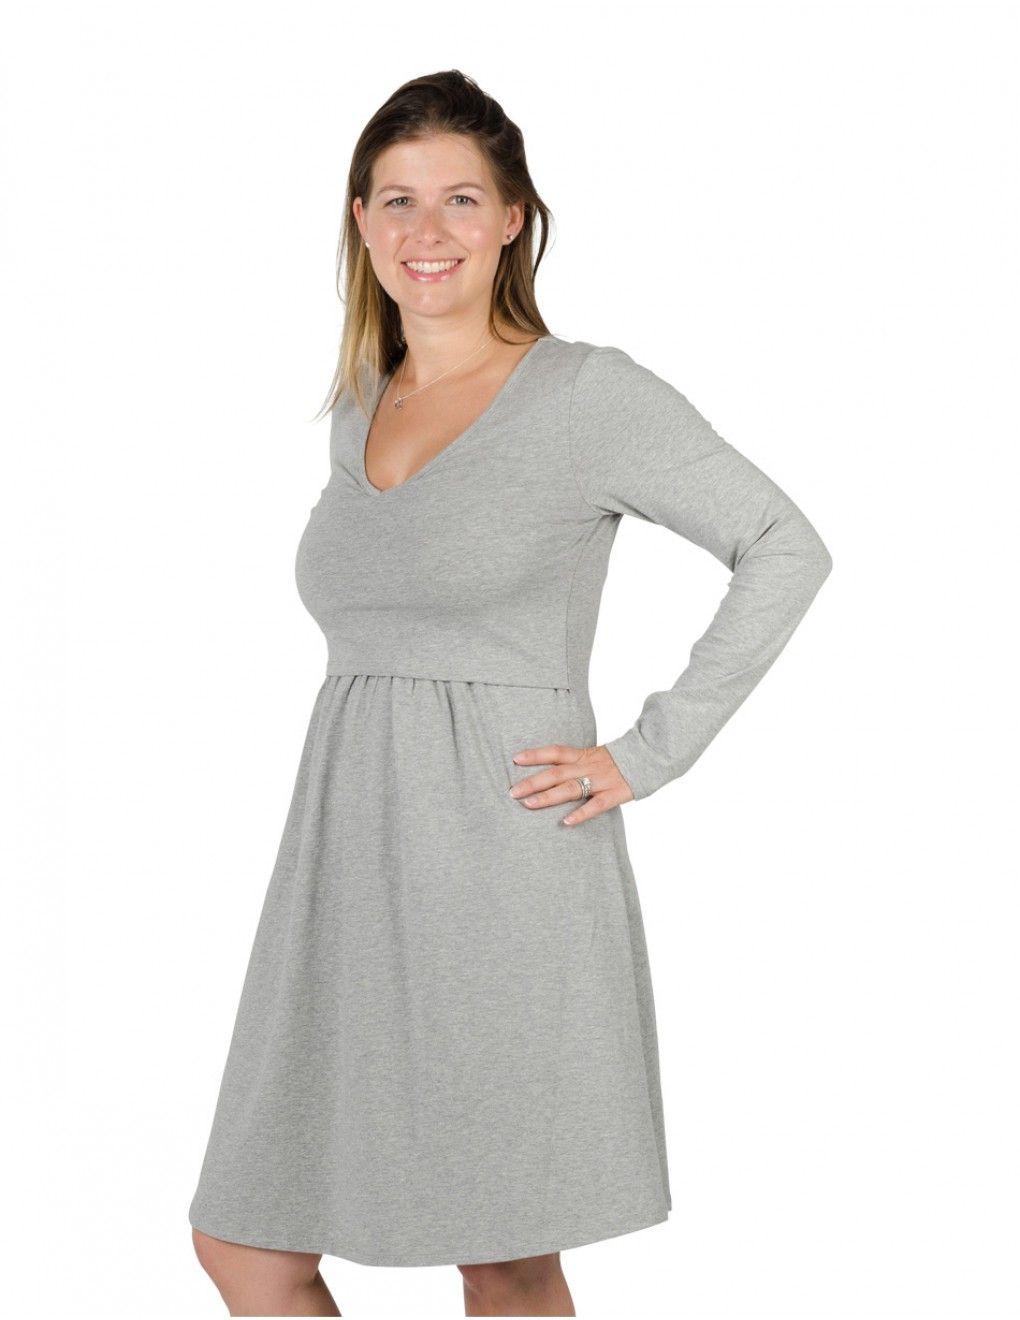 Maternitynursing dress elena nursing cotton dresses and warm maternitynursing dress elena ombrellifo Image collections